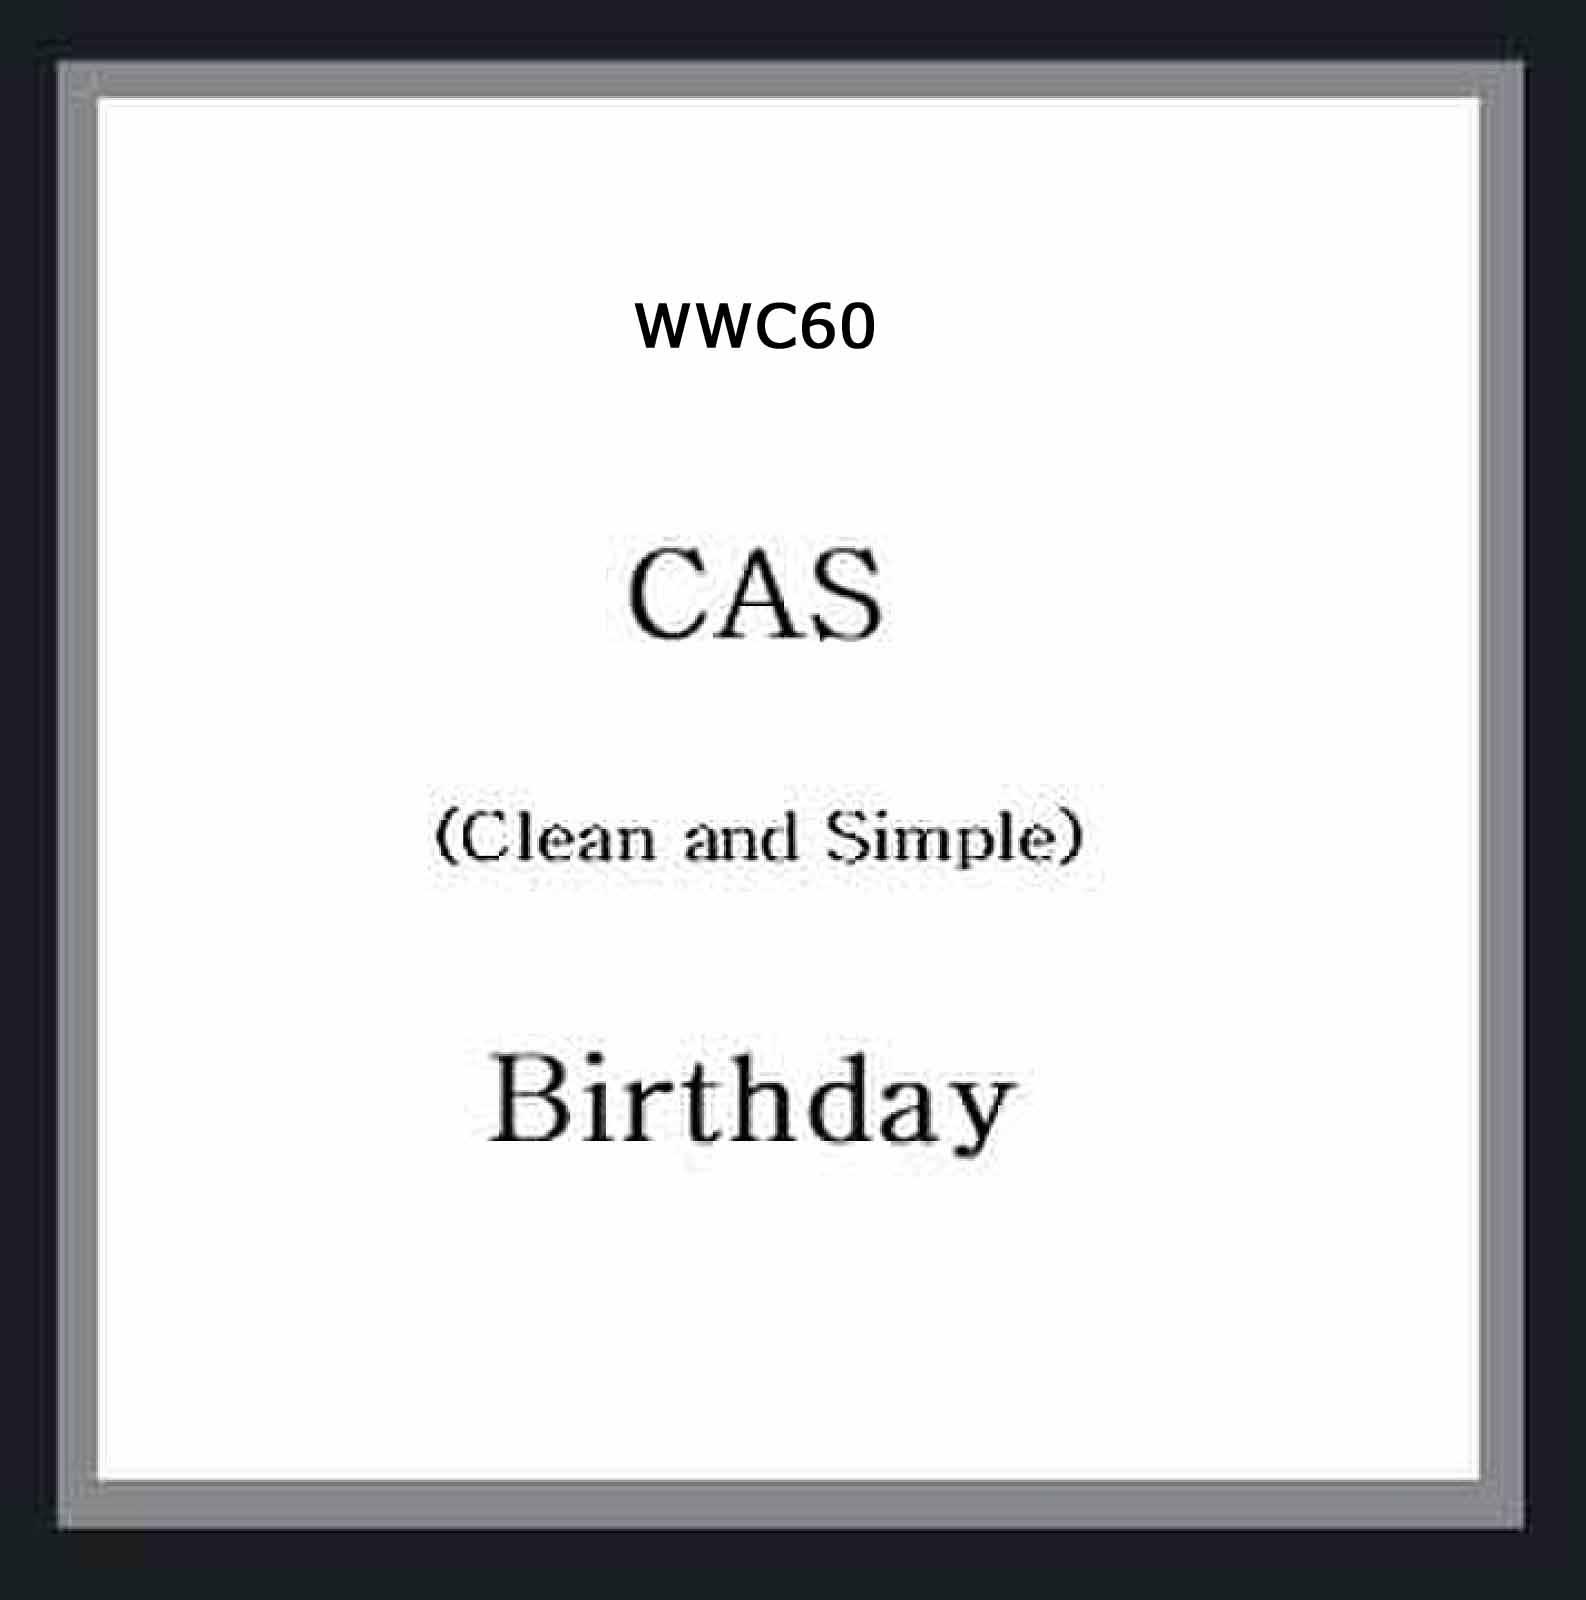 WWC60_03-23